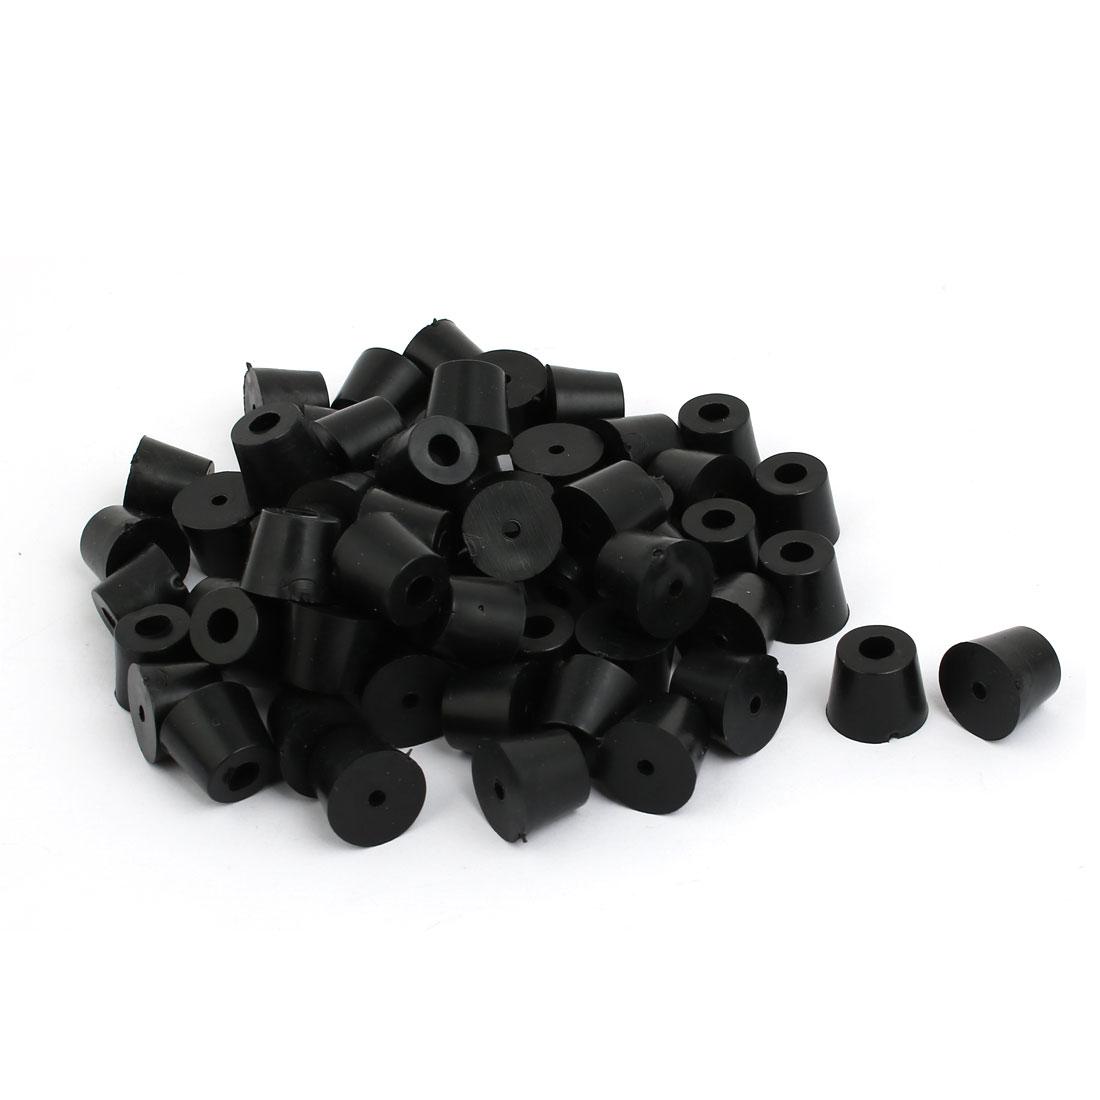 17mmx13mmx14mm Rubber Cone Shaped Furniture Foot Pad Bumper Black 80pcs